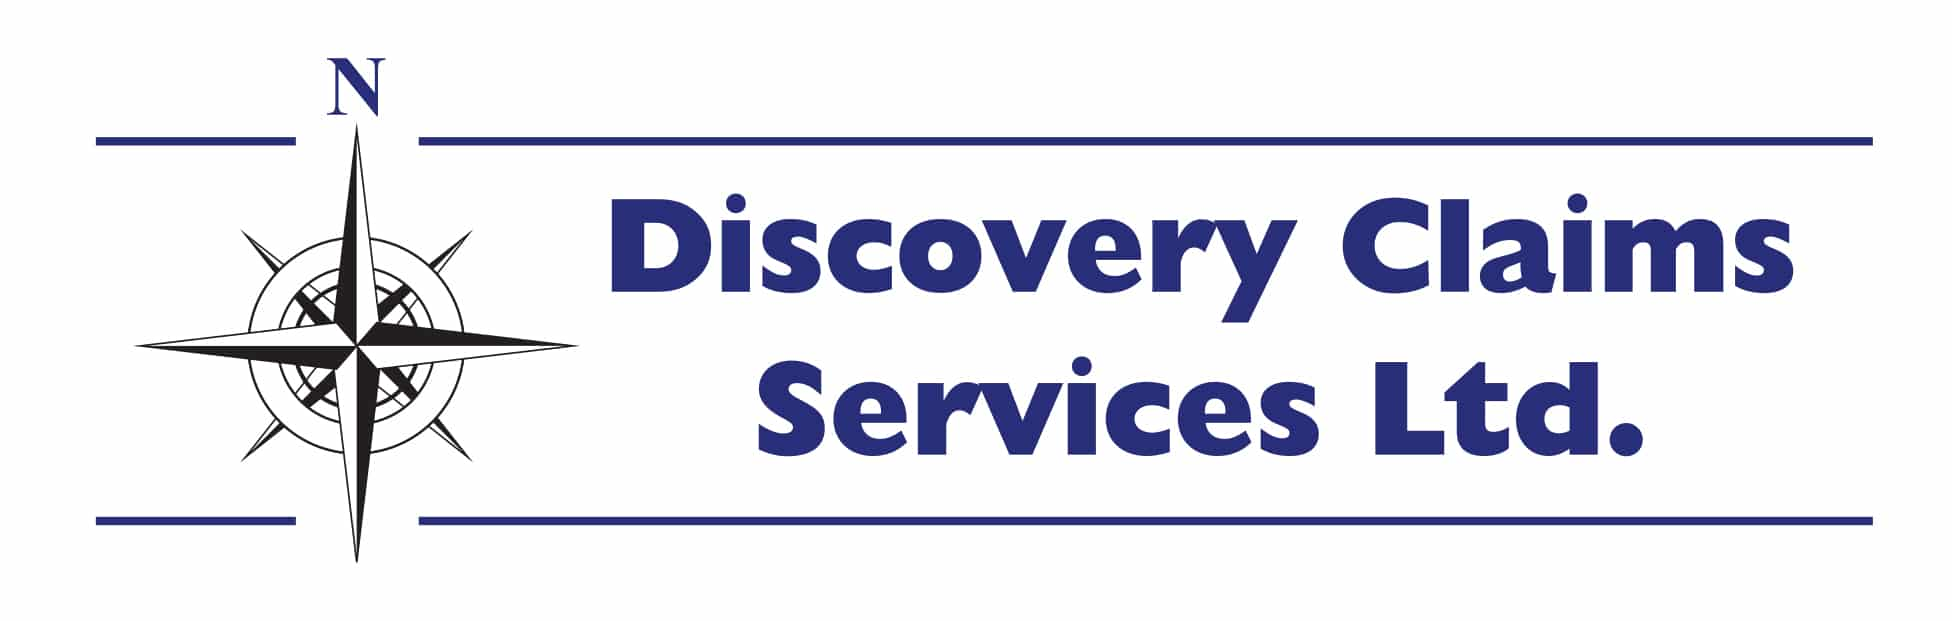 Discovery Claims logoCMYK